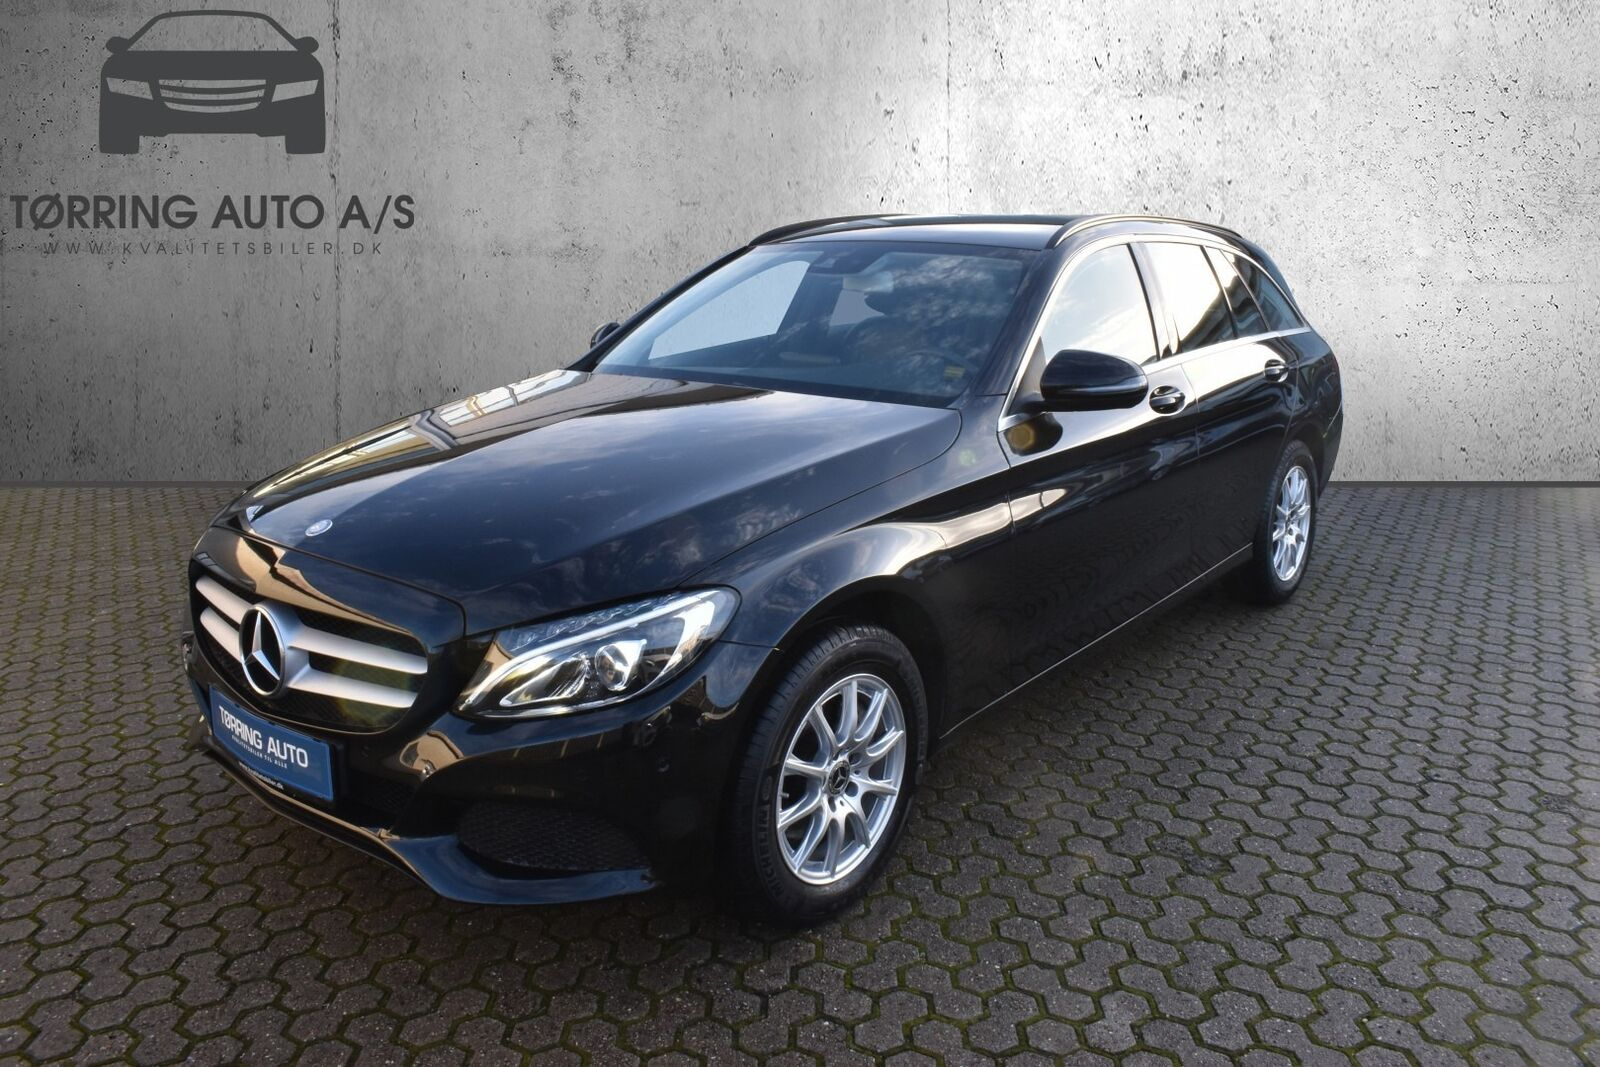 Mercedes C200 2,0 stc. 5d